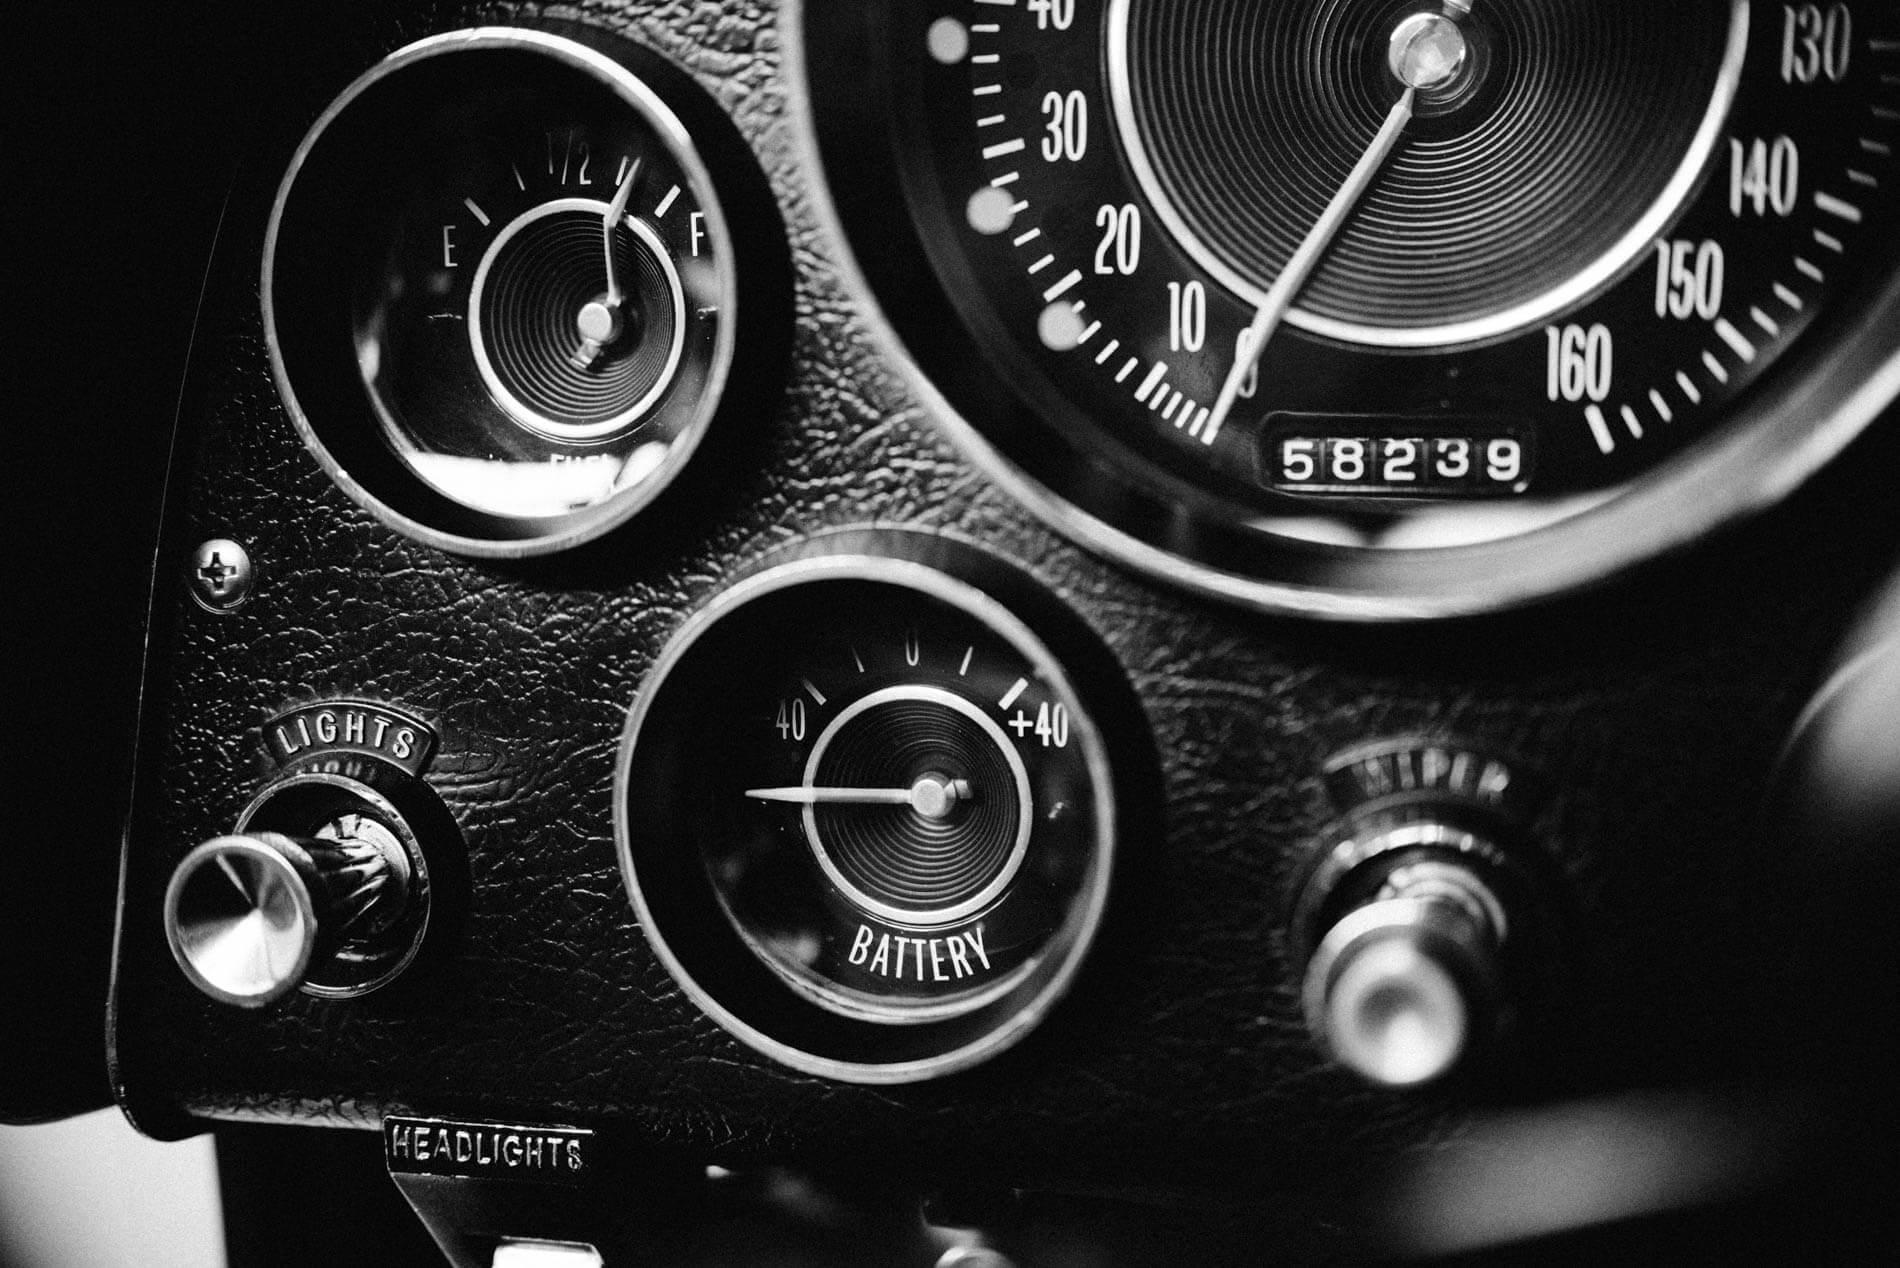 US Car Classics sascha hoecker kramm newsletter us cars classic 14